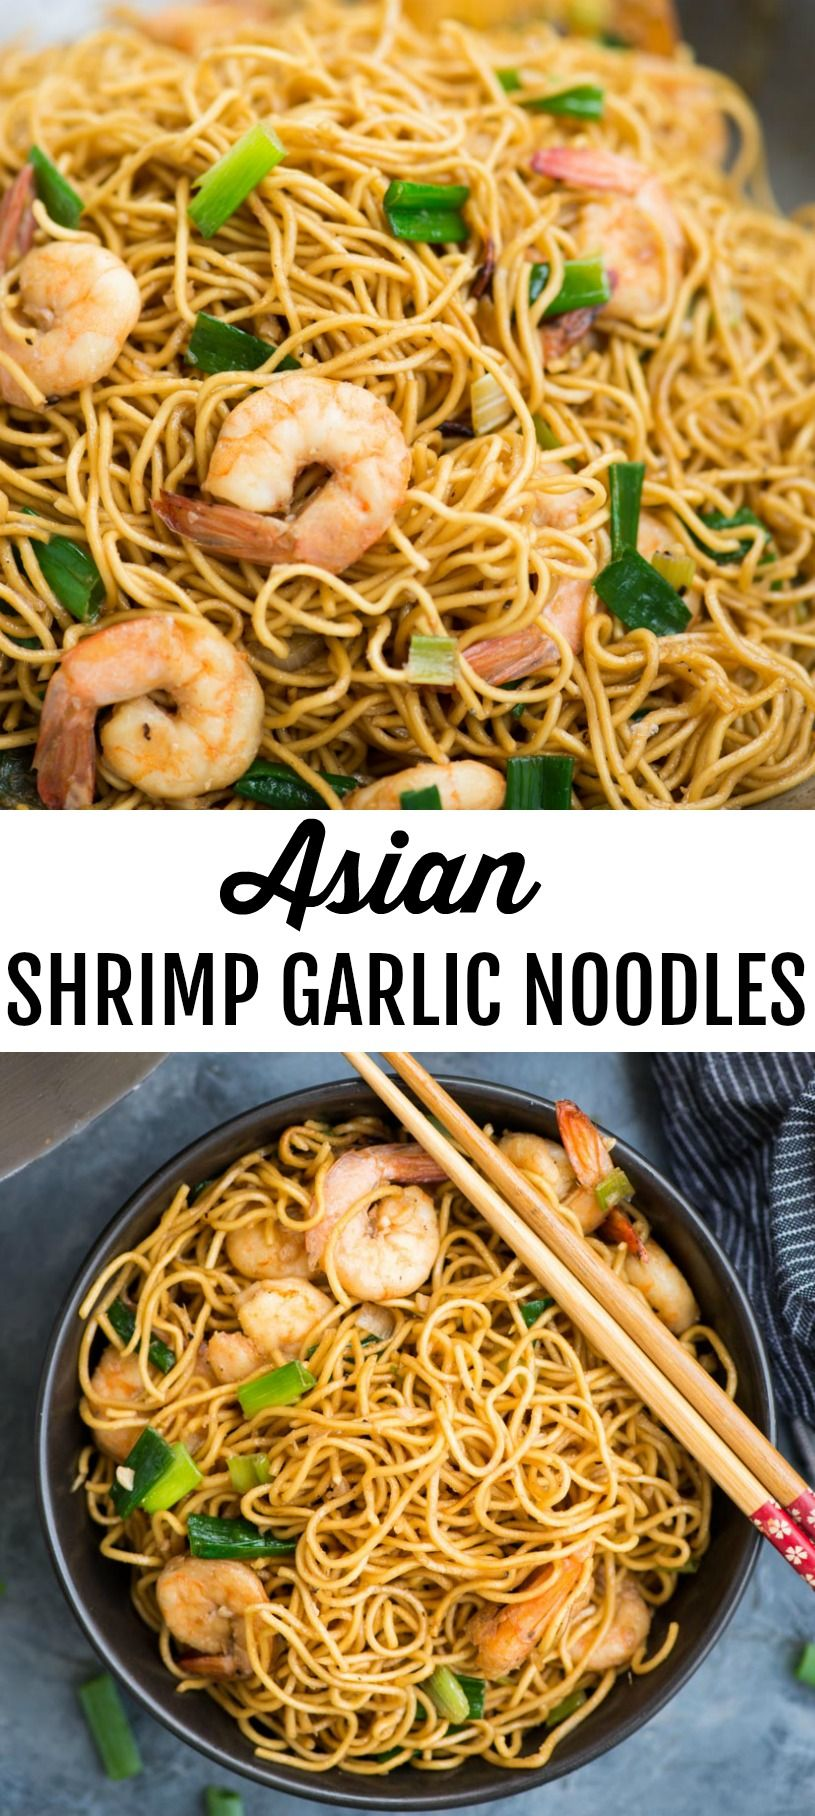 ASIAN SHRIMP GARLIC NOODLES - The flavours of kitchen